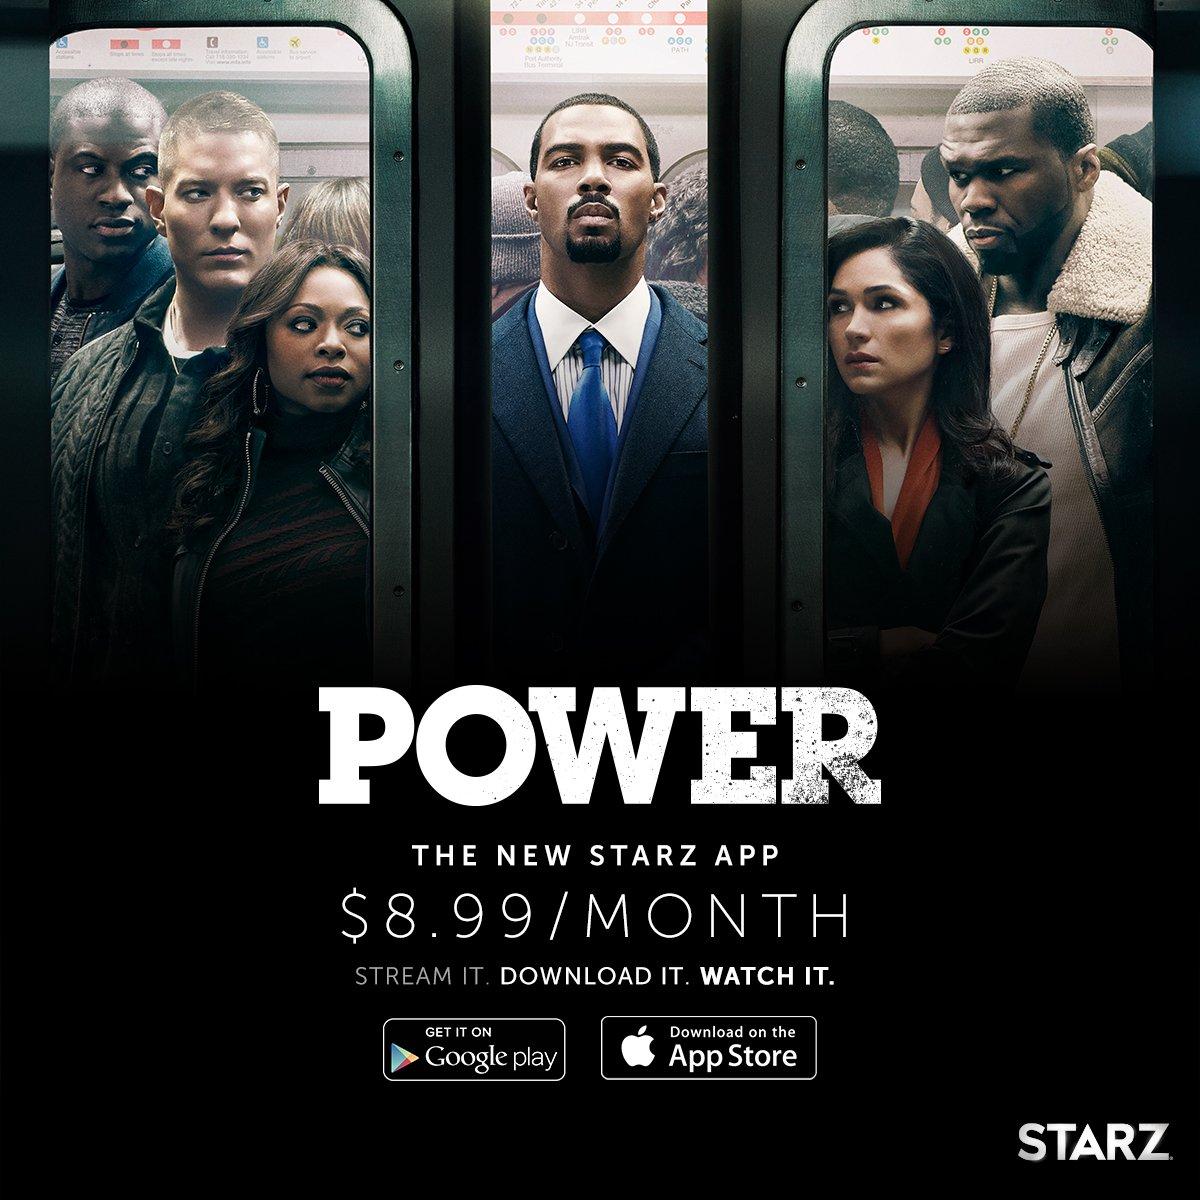 STARZ got an app now you can watch the best show @Power_STARZ any where. don't miss it https://t.co/HgnEkTPVlN https://t.co/oNMpl7AFzf